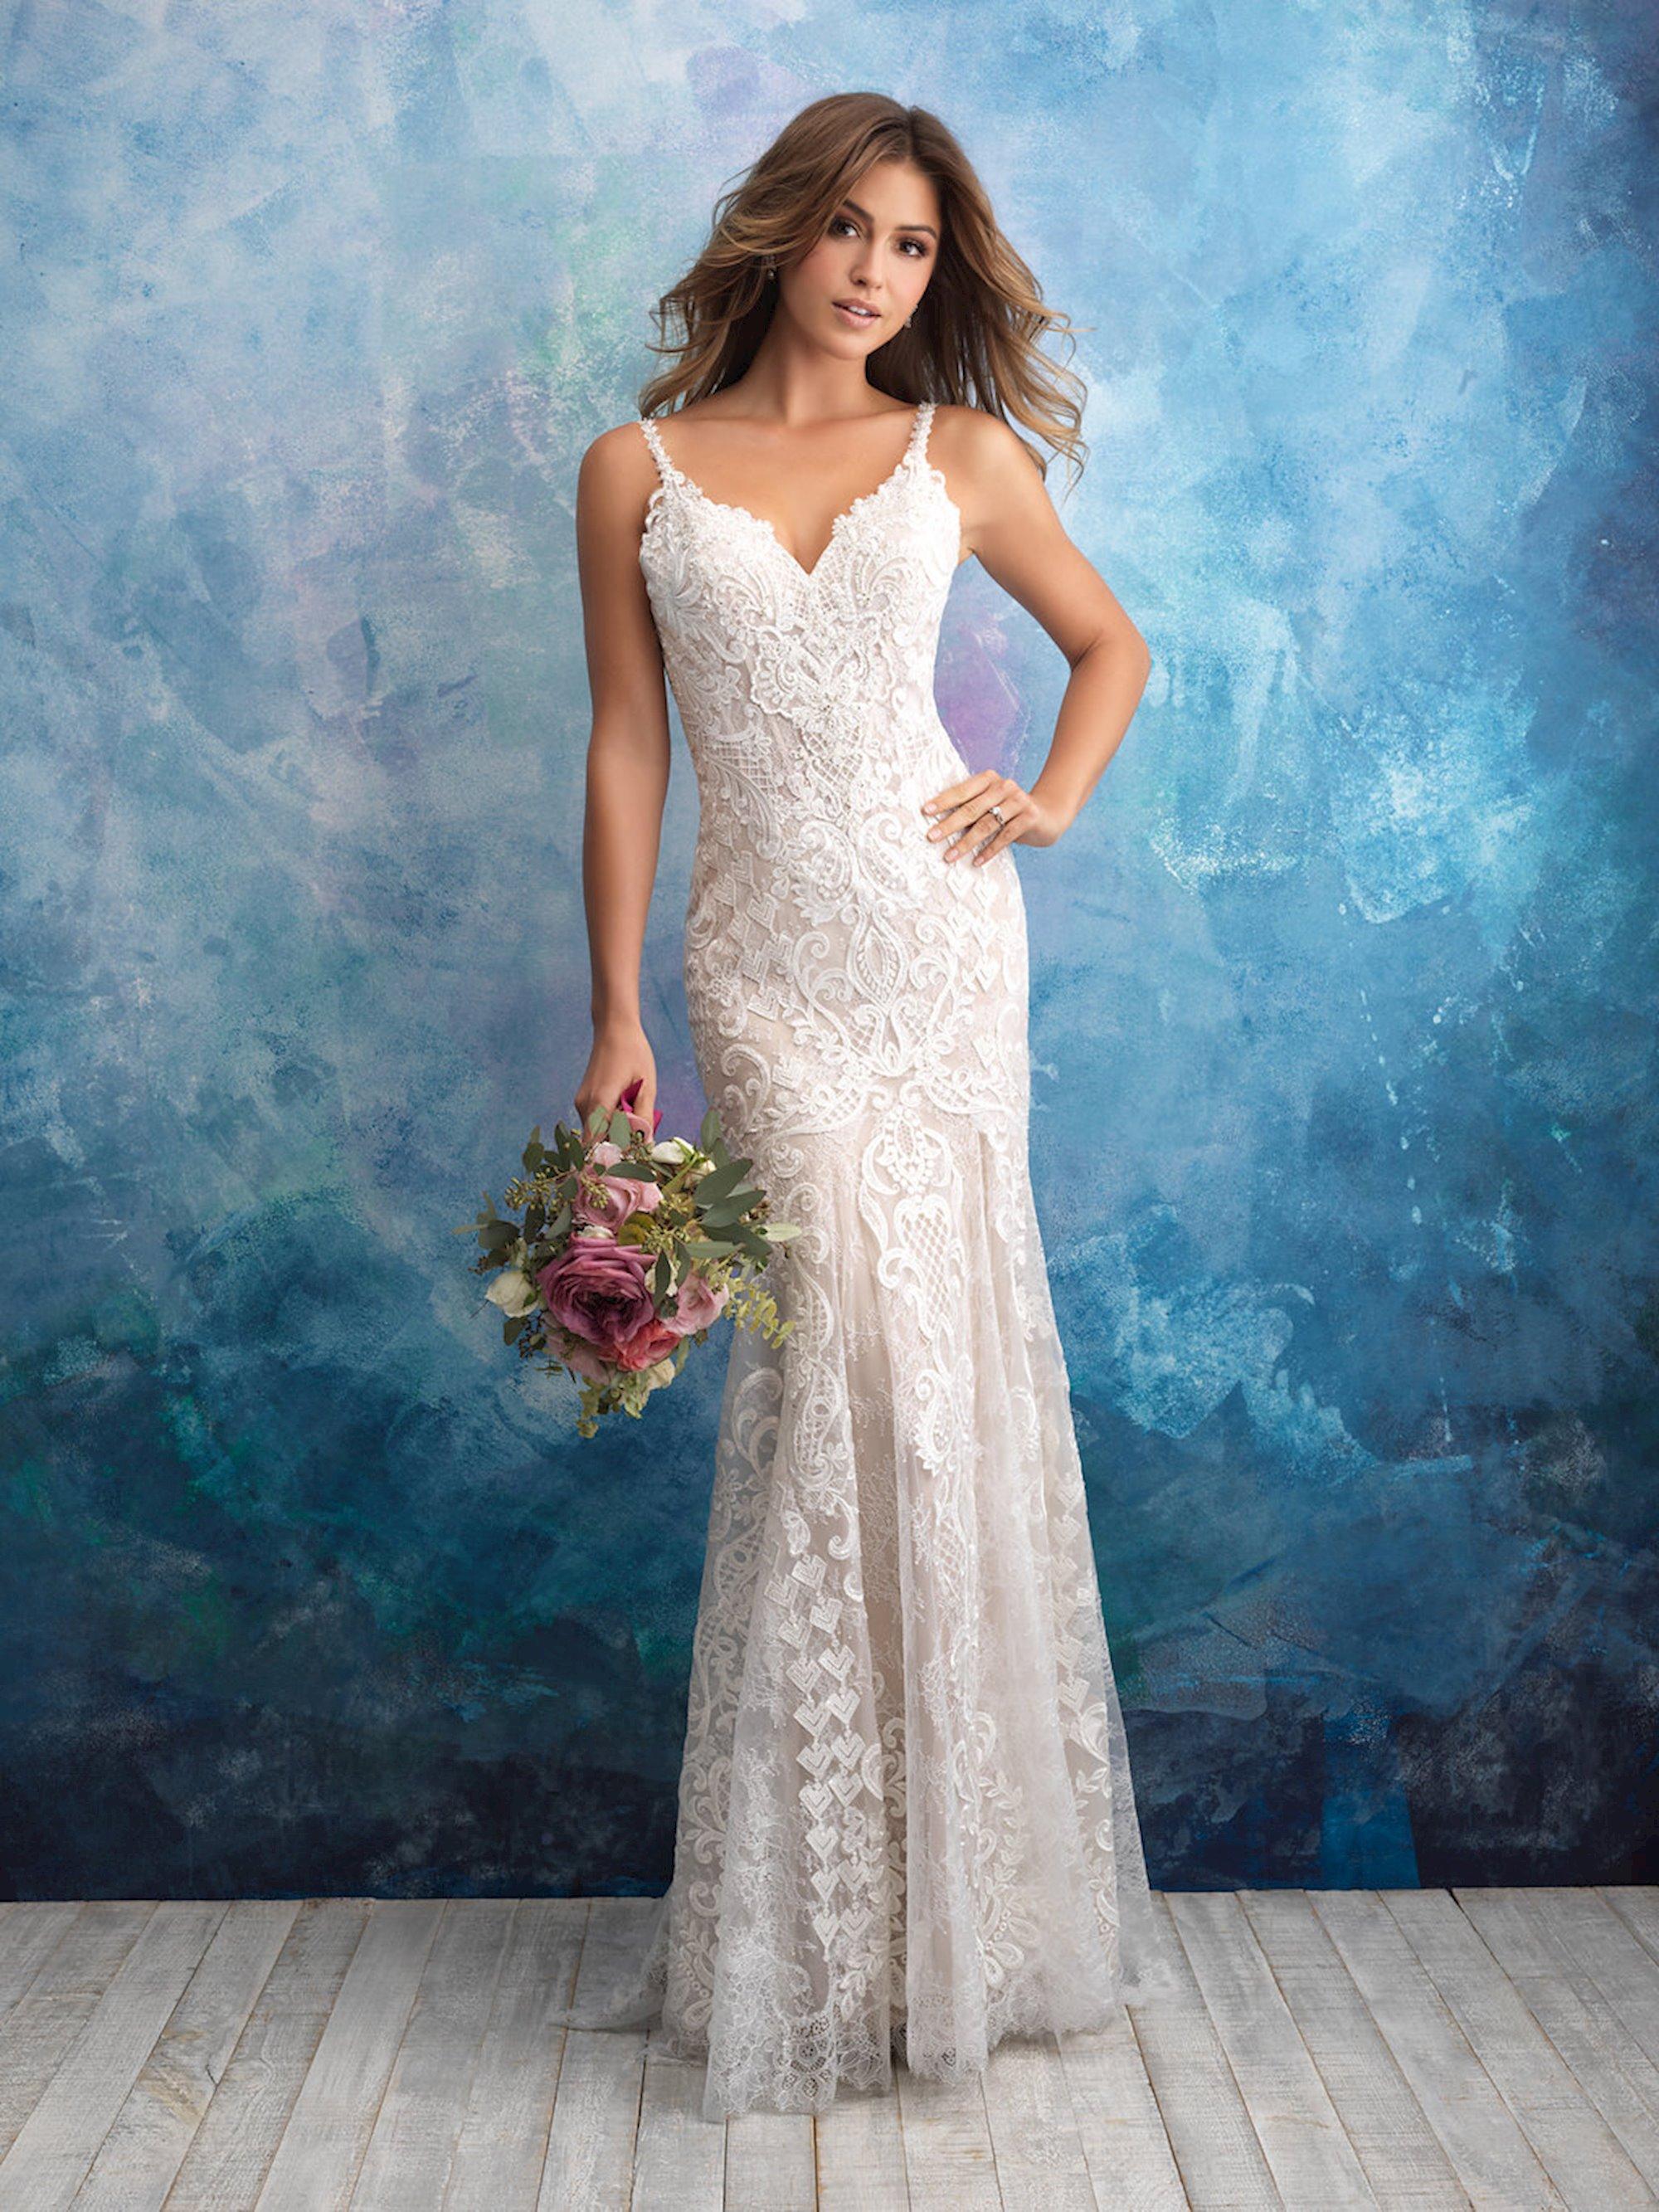 Allure Bridals Aline 20954 - Vows Bridal